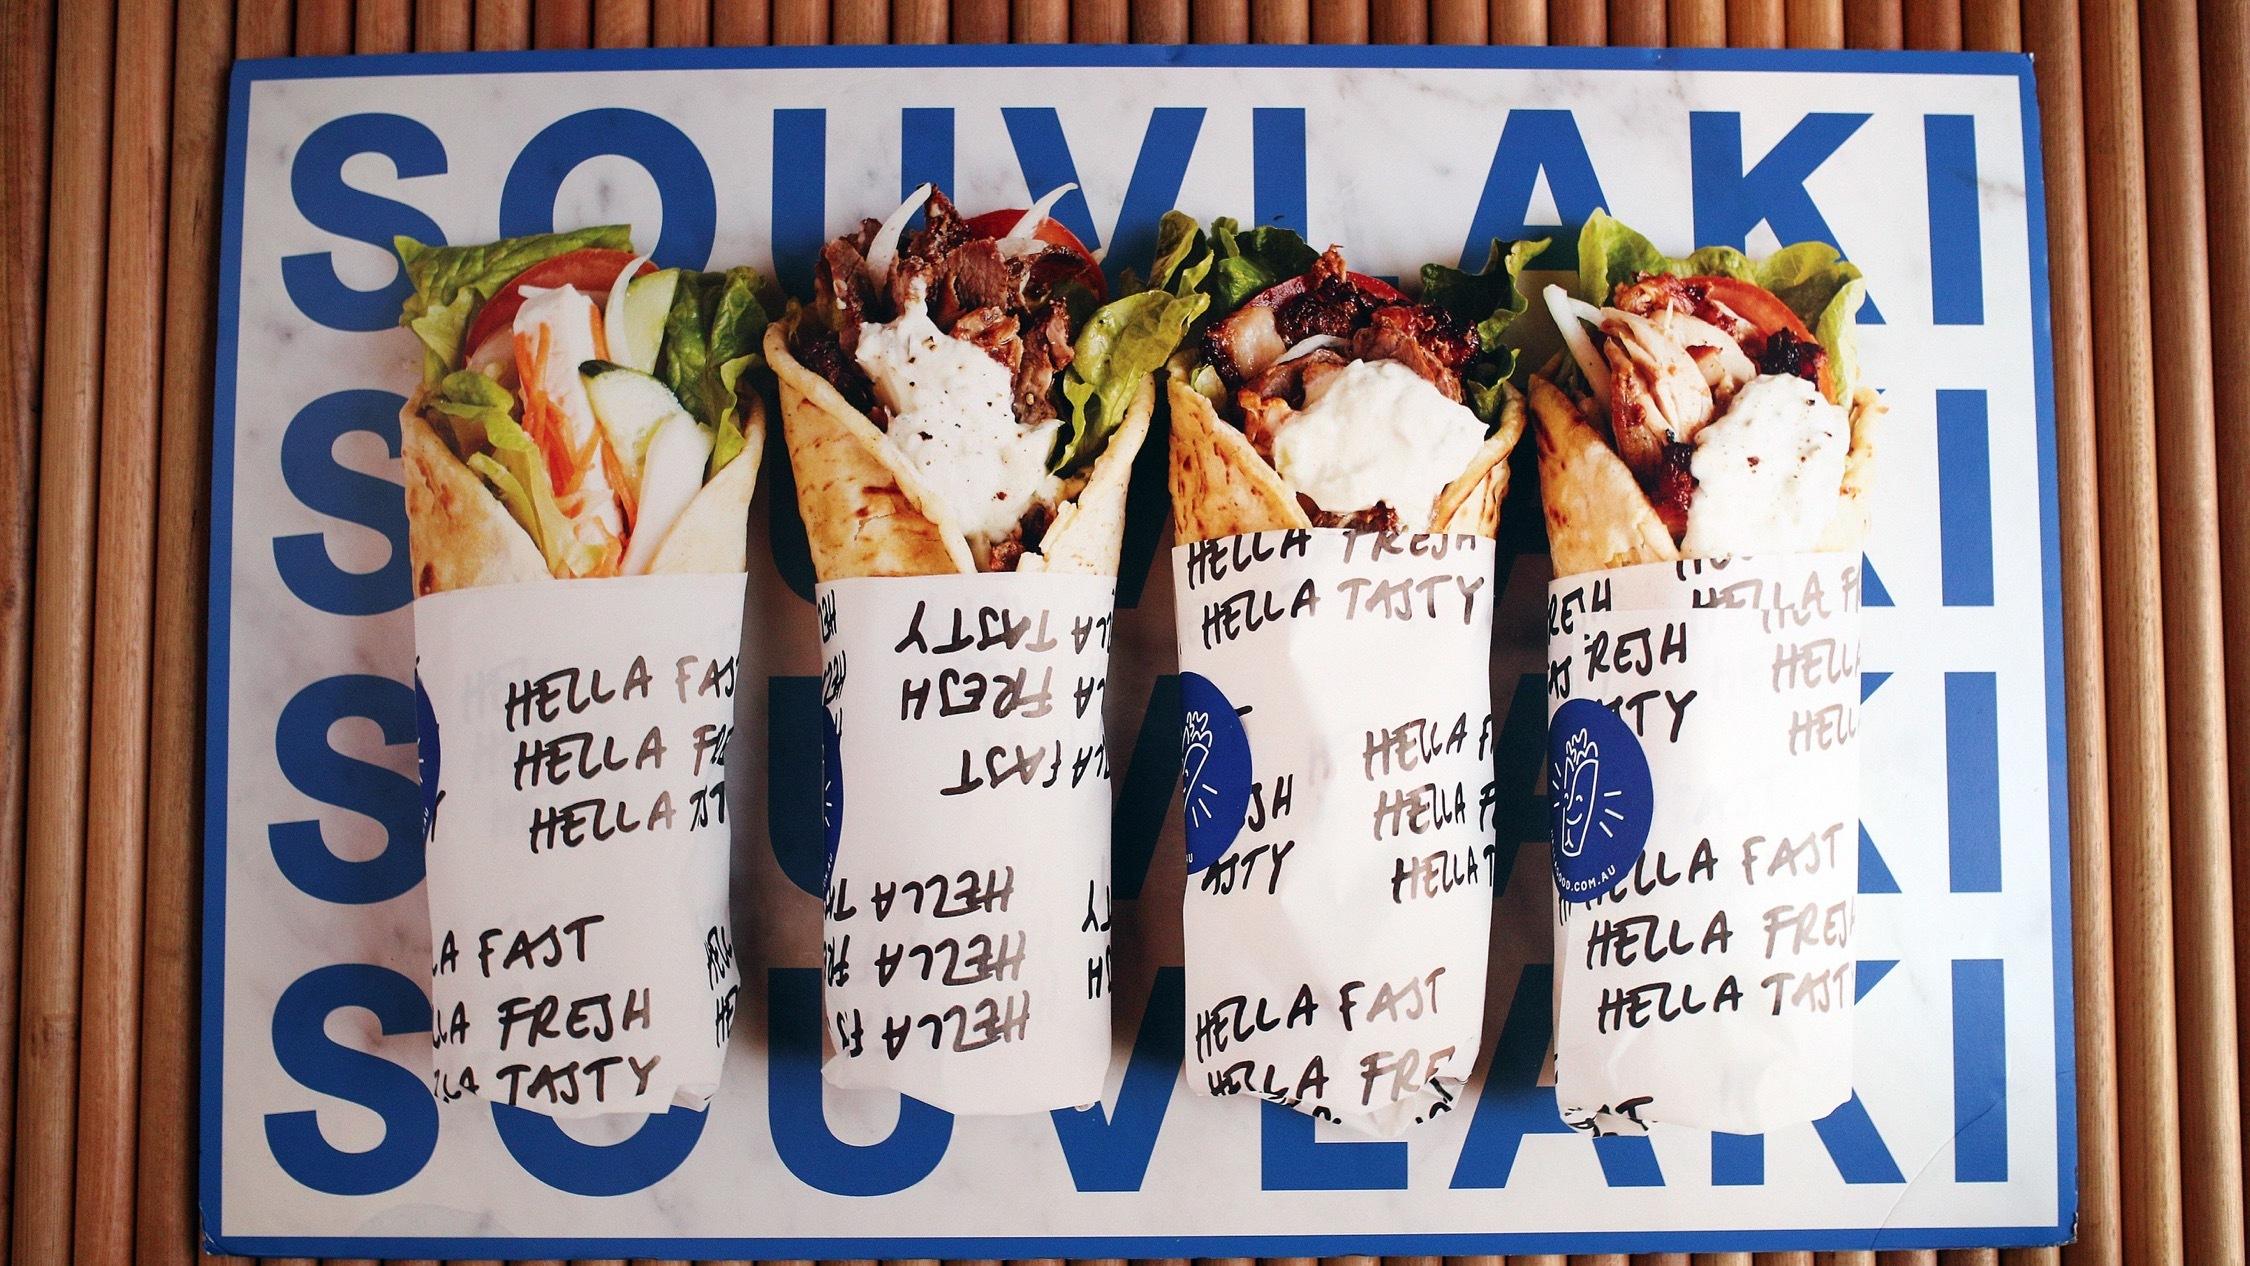 Food wrap kebab at Hella Good Melbourne